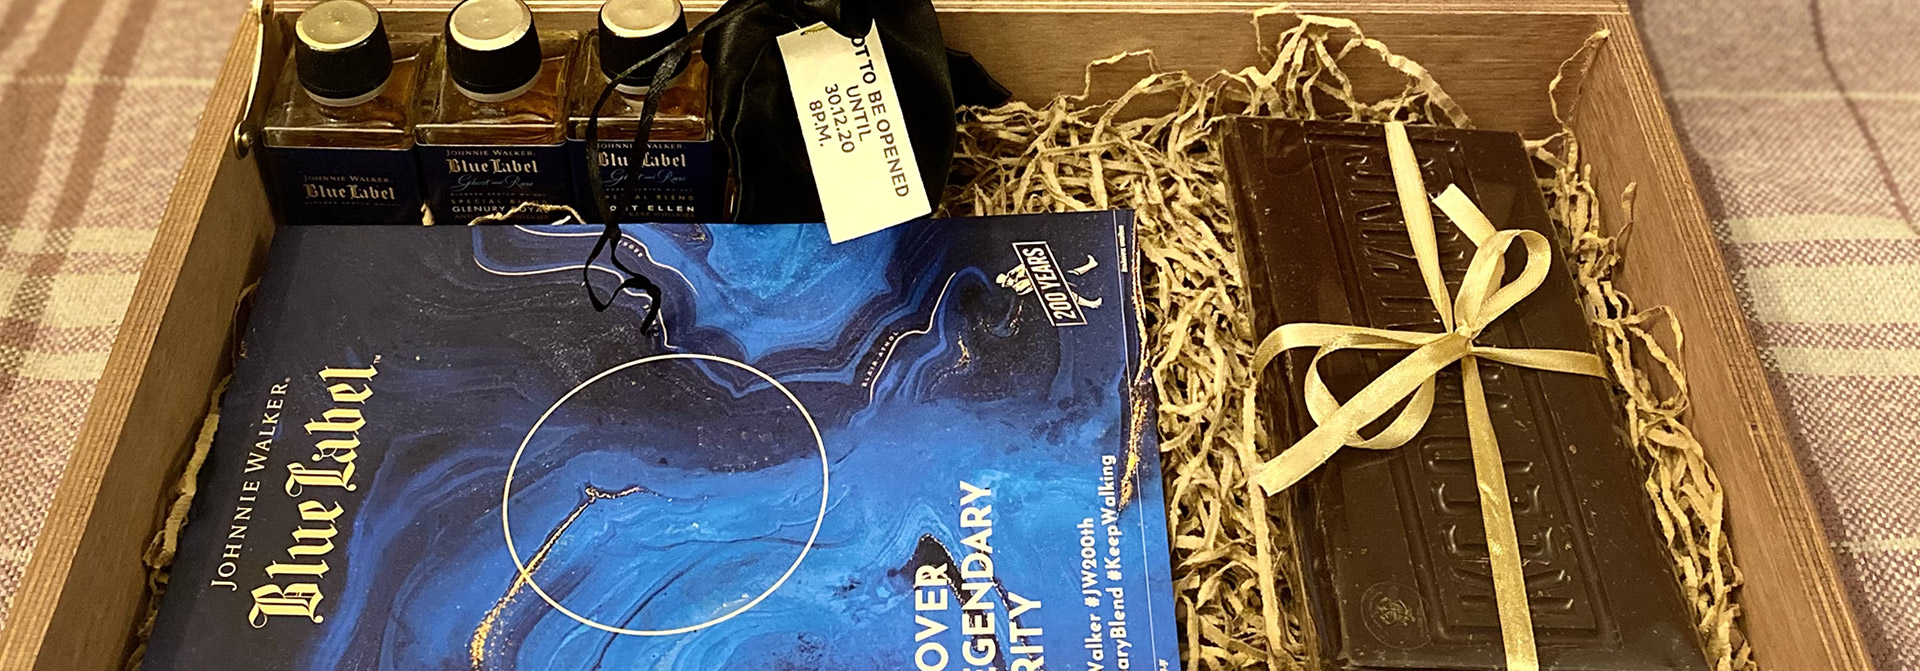 The Tasters Club Johnnie Walker 200 years Blue Label whisky tasting